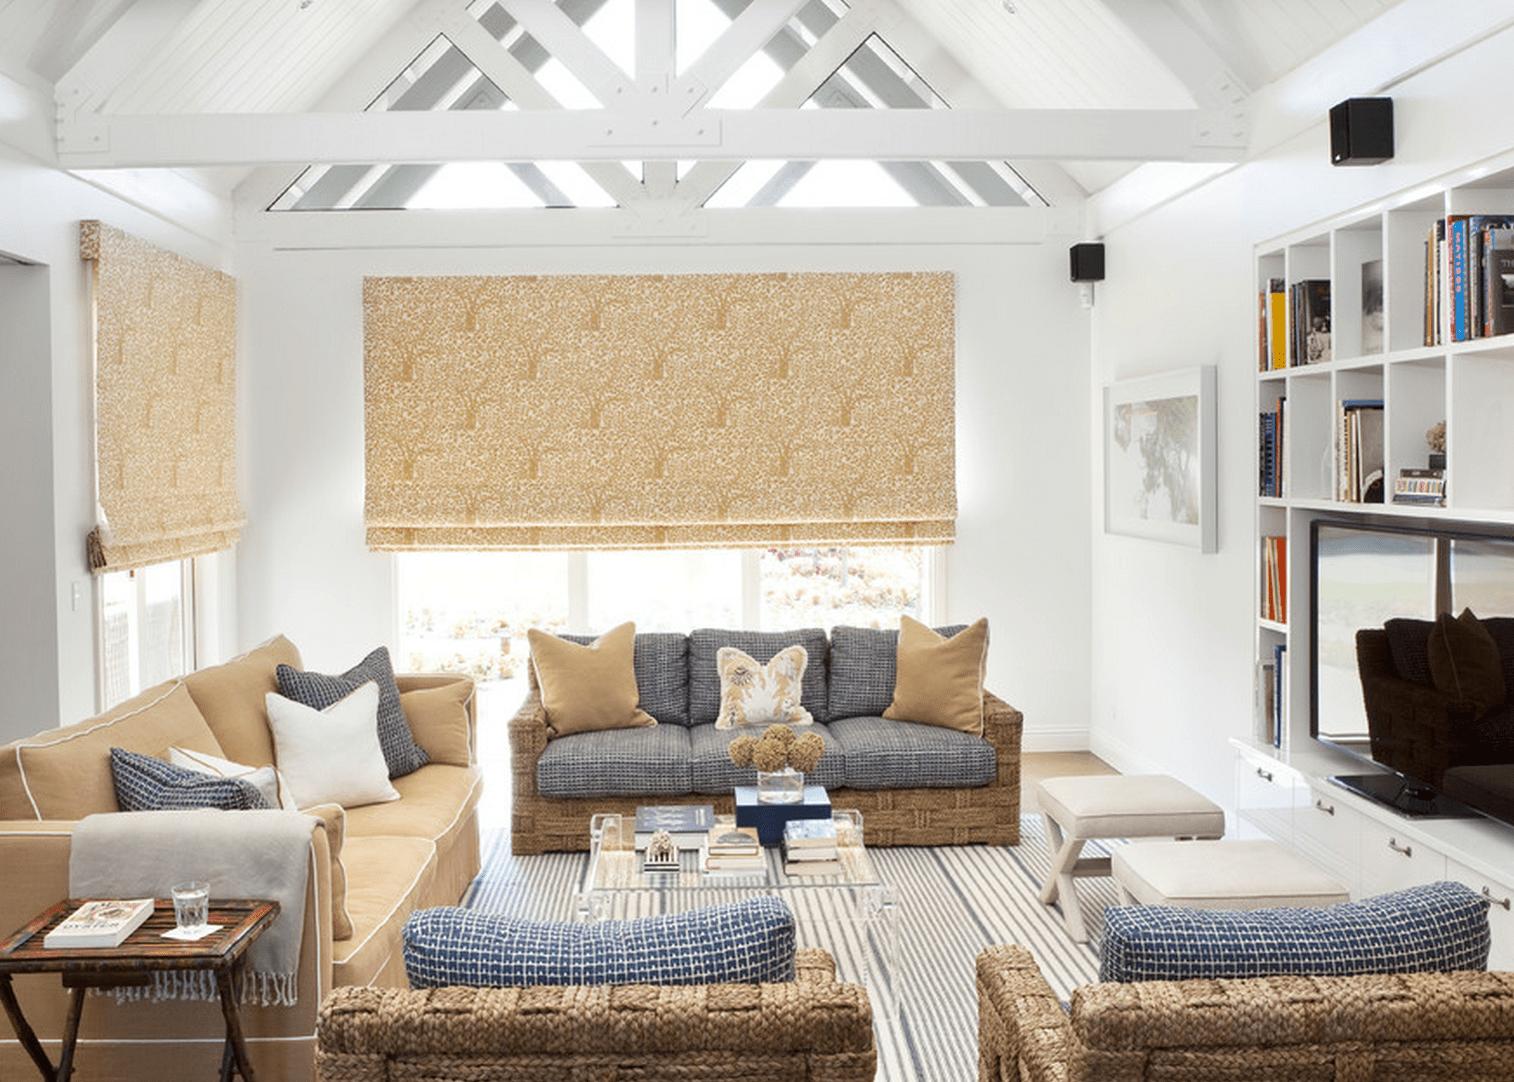 A beach house-inspired interior design